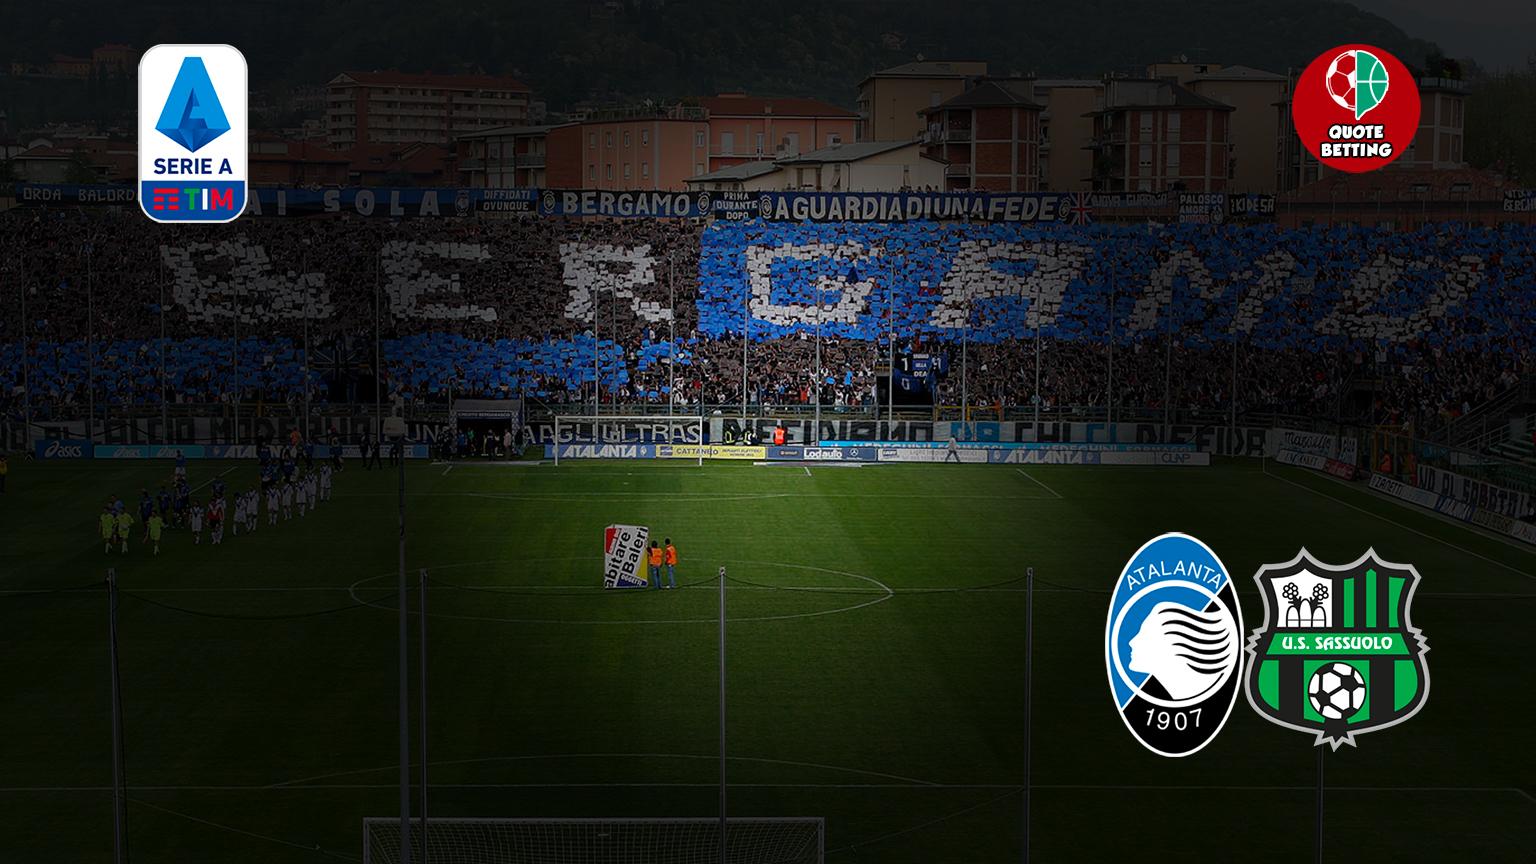 peluang atalanta-sassuolo tempat untuk melihat di tv peluang prediksi formasi seri a taruhan sepak bola italia stadion atalanta-sassuolo